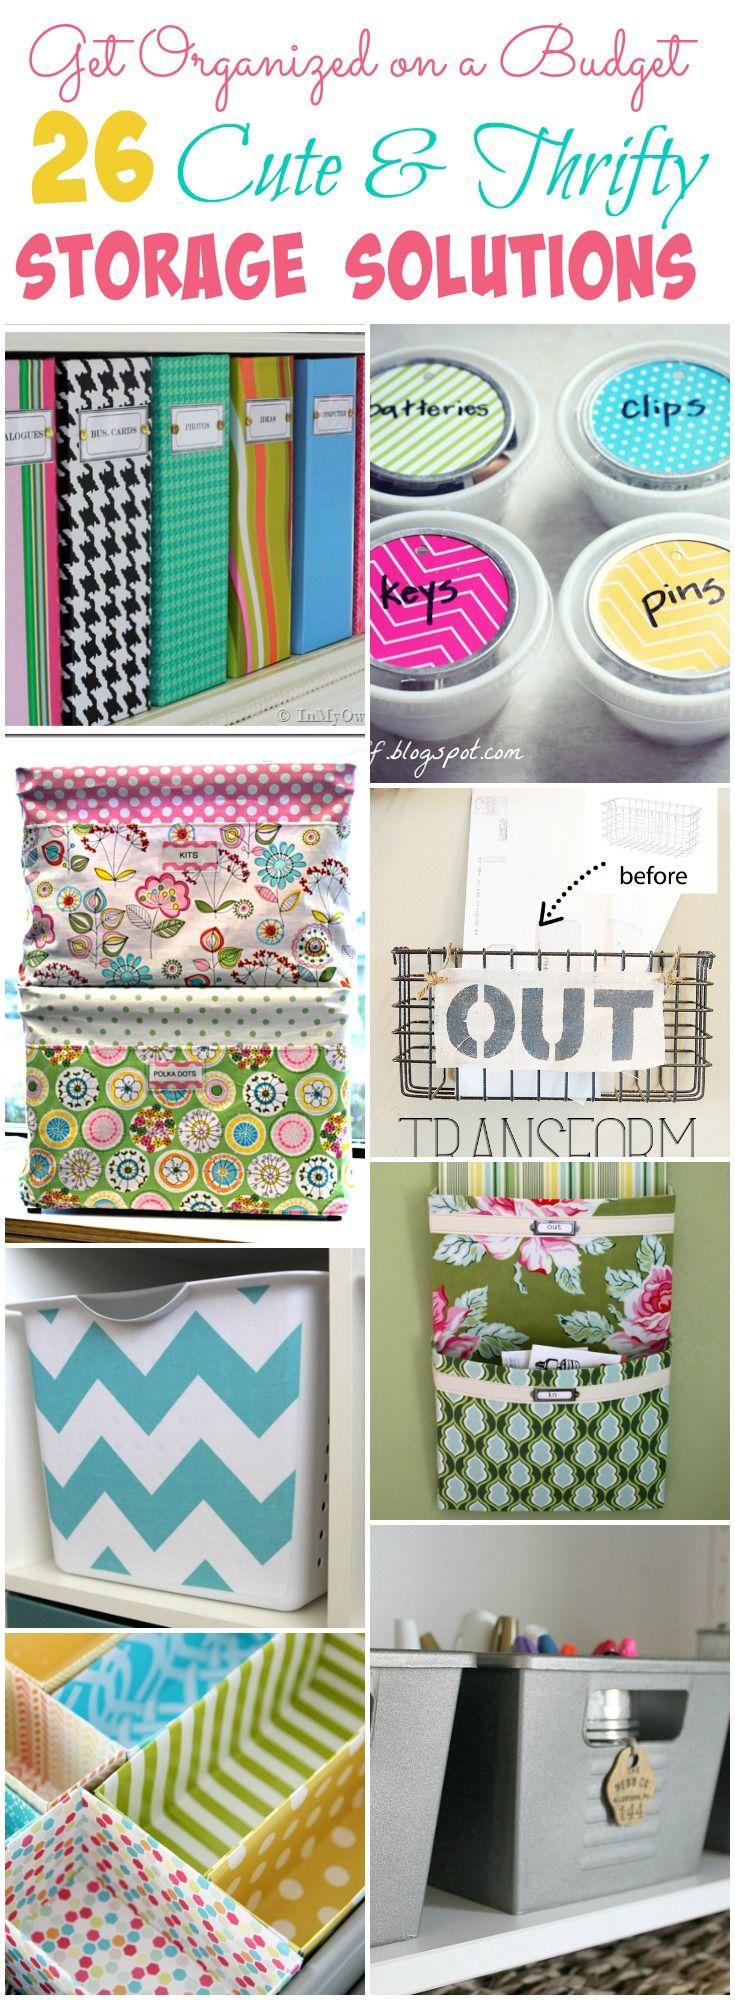 307 Best Diy Teen Room Decor Images On Pinterest College